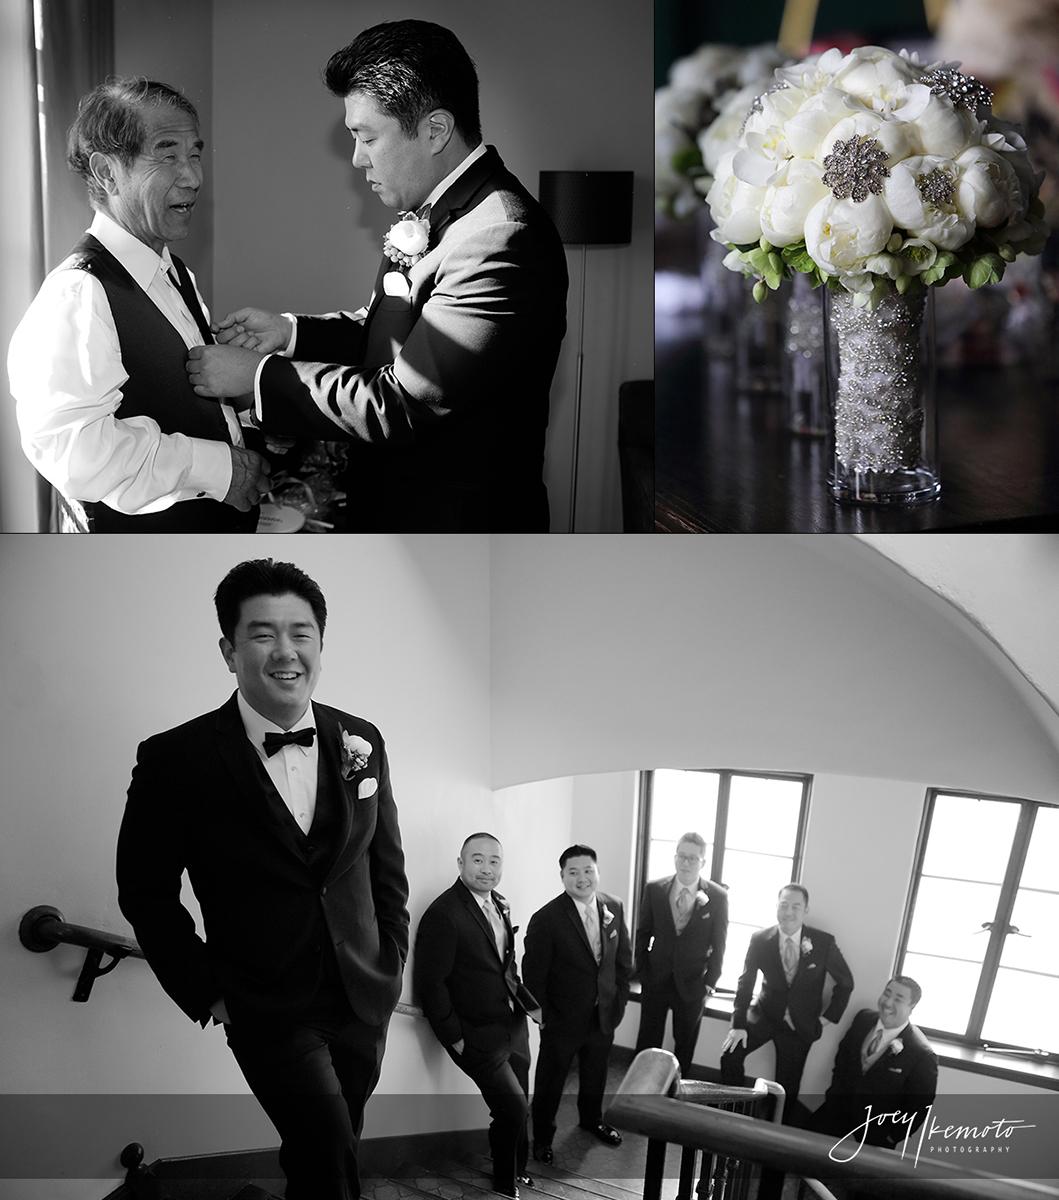 Vibiana-Los-Angeles-Weddings_0007_Blog-Collage-1452302686285